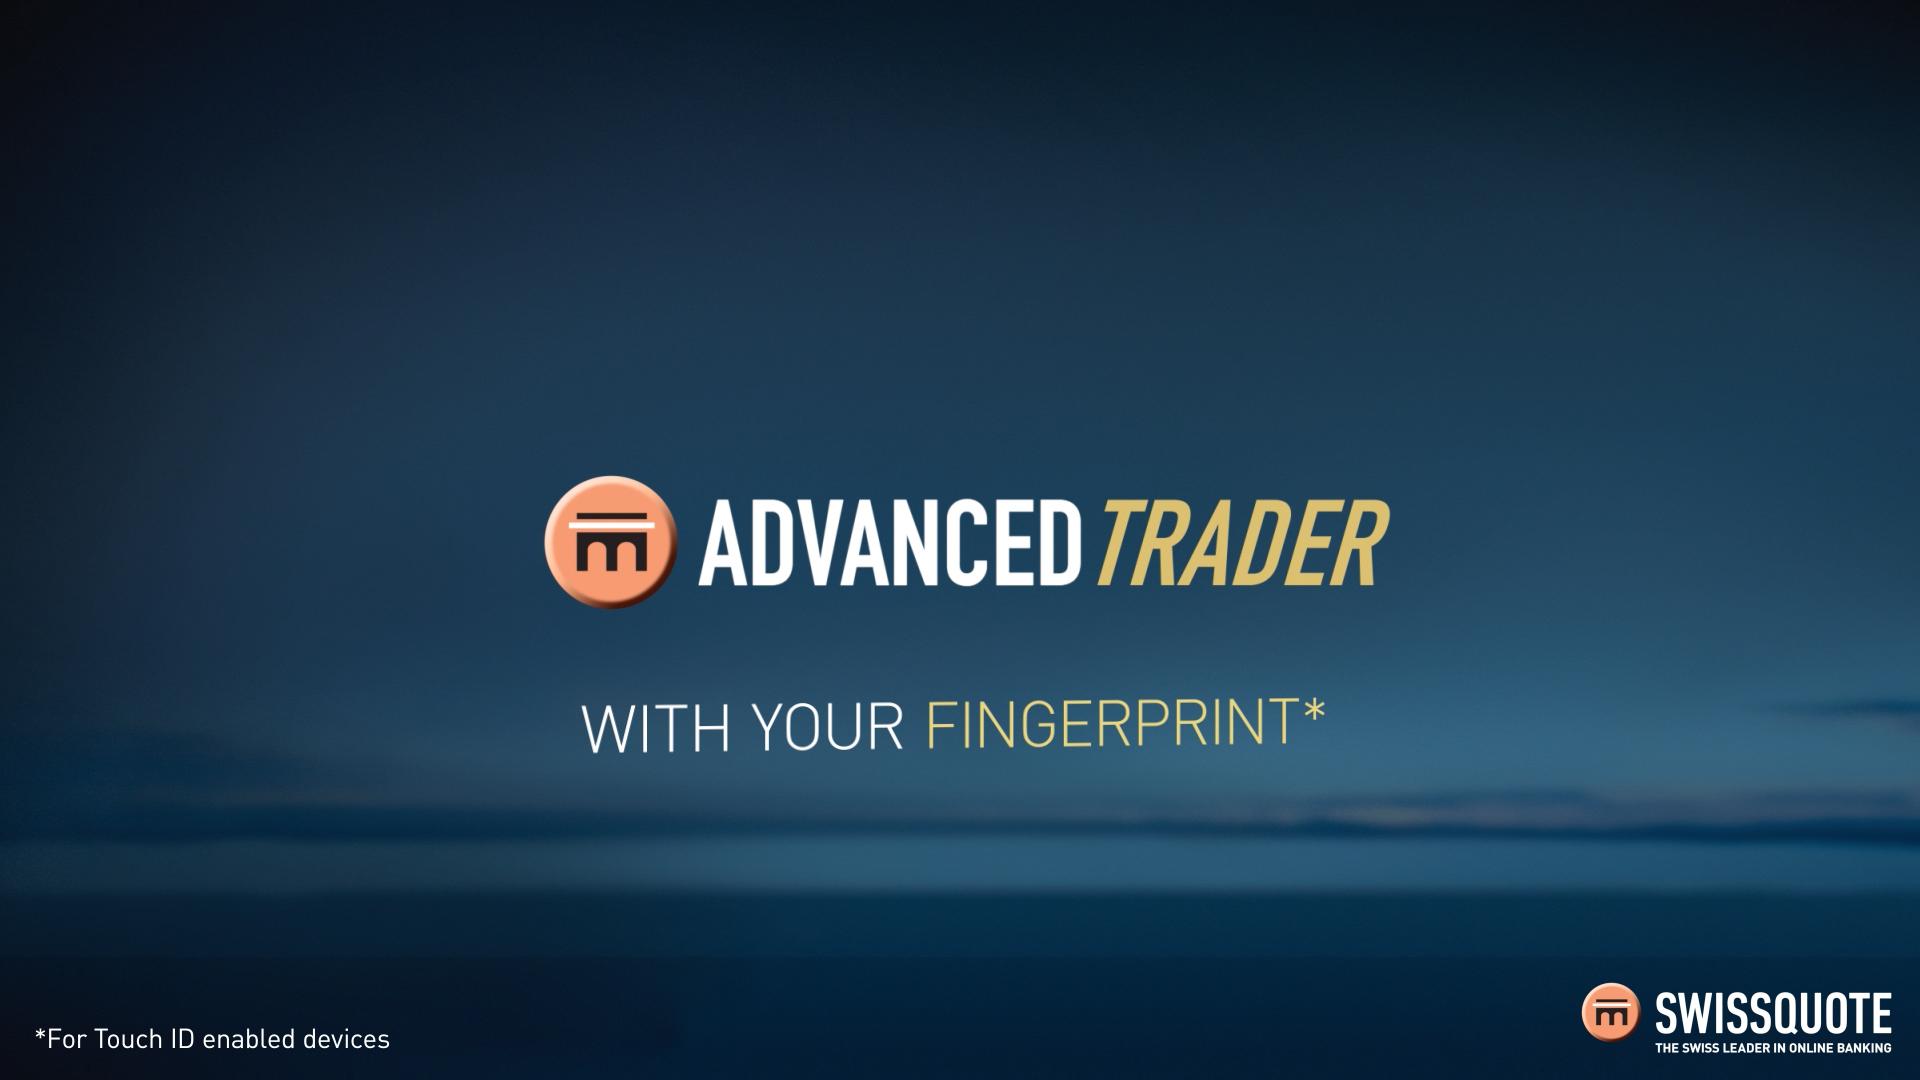 swissquote-Advanced-Trader-01-web.jpg